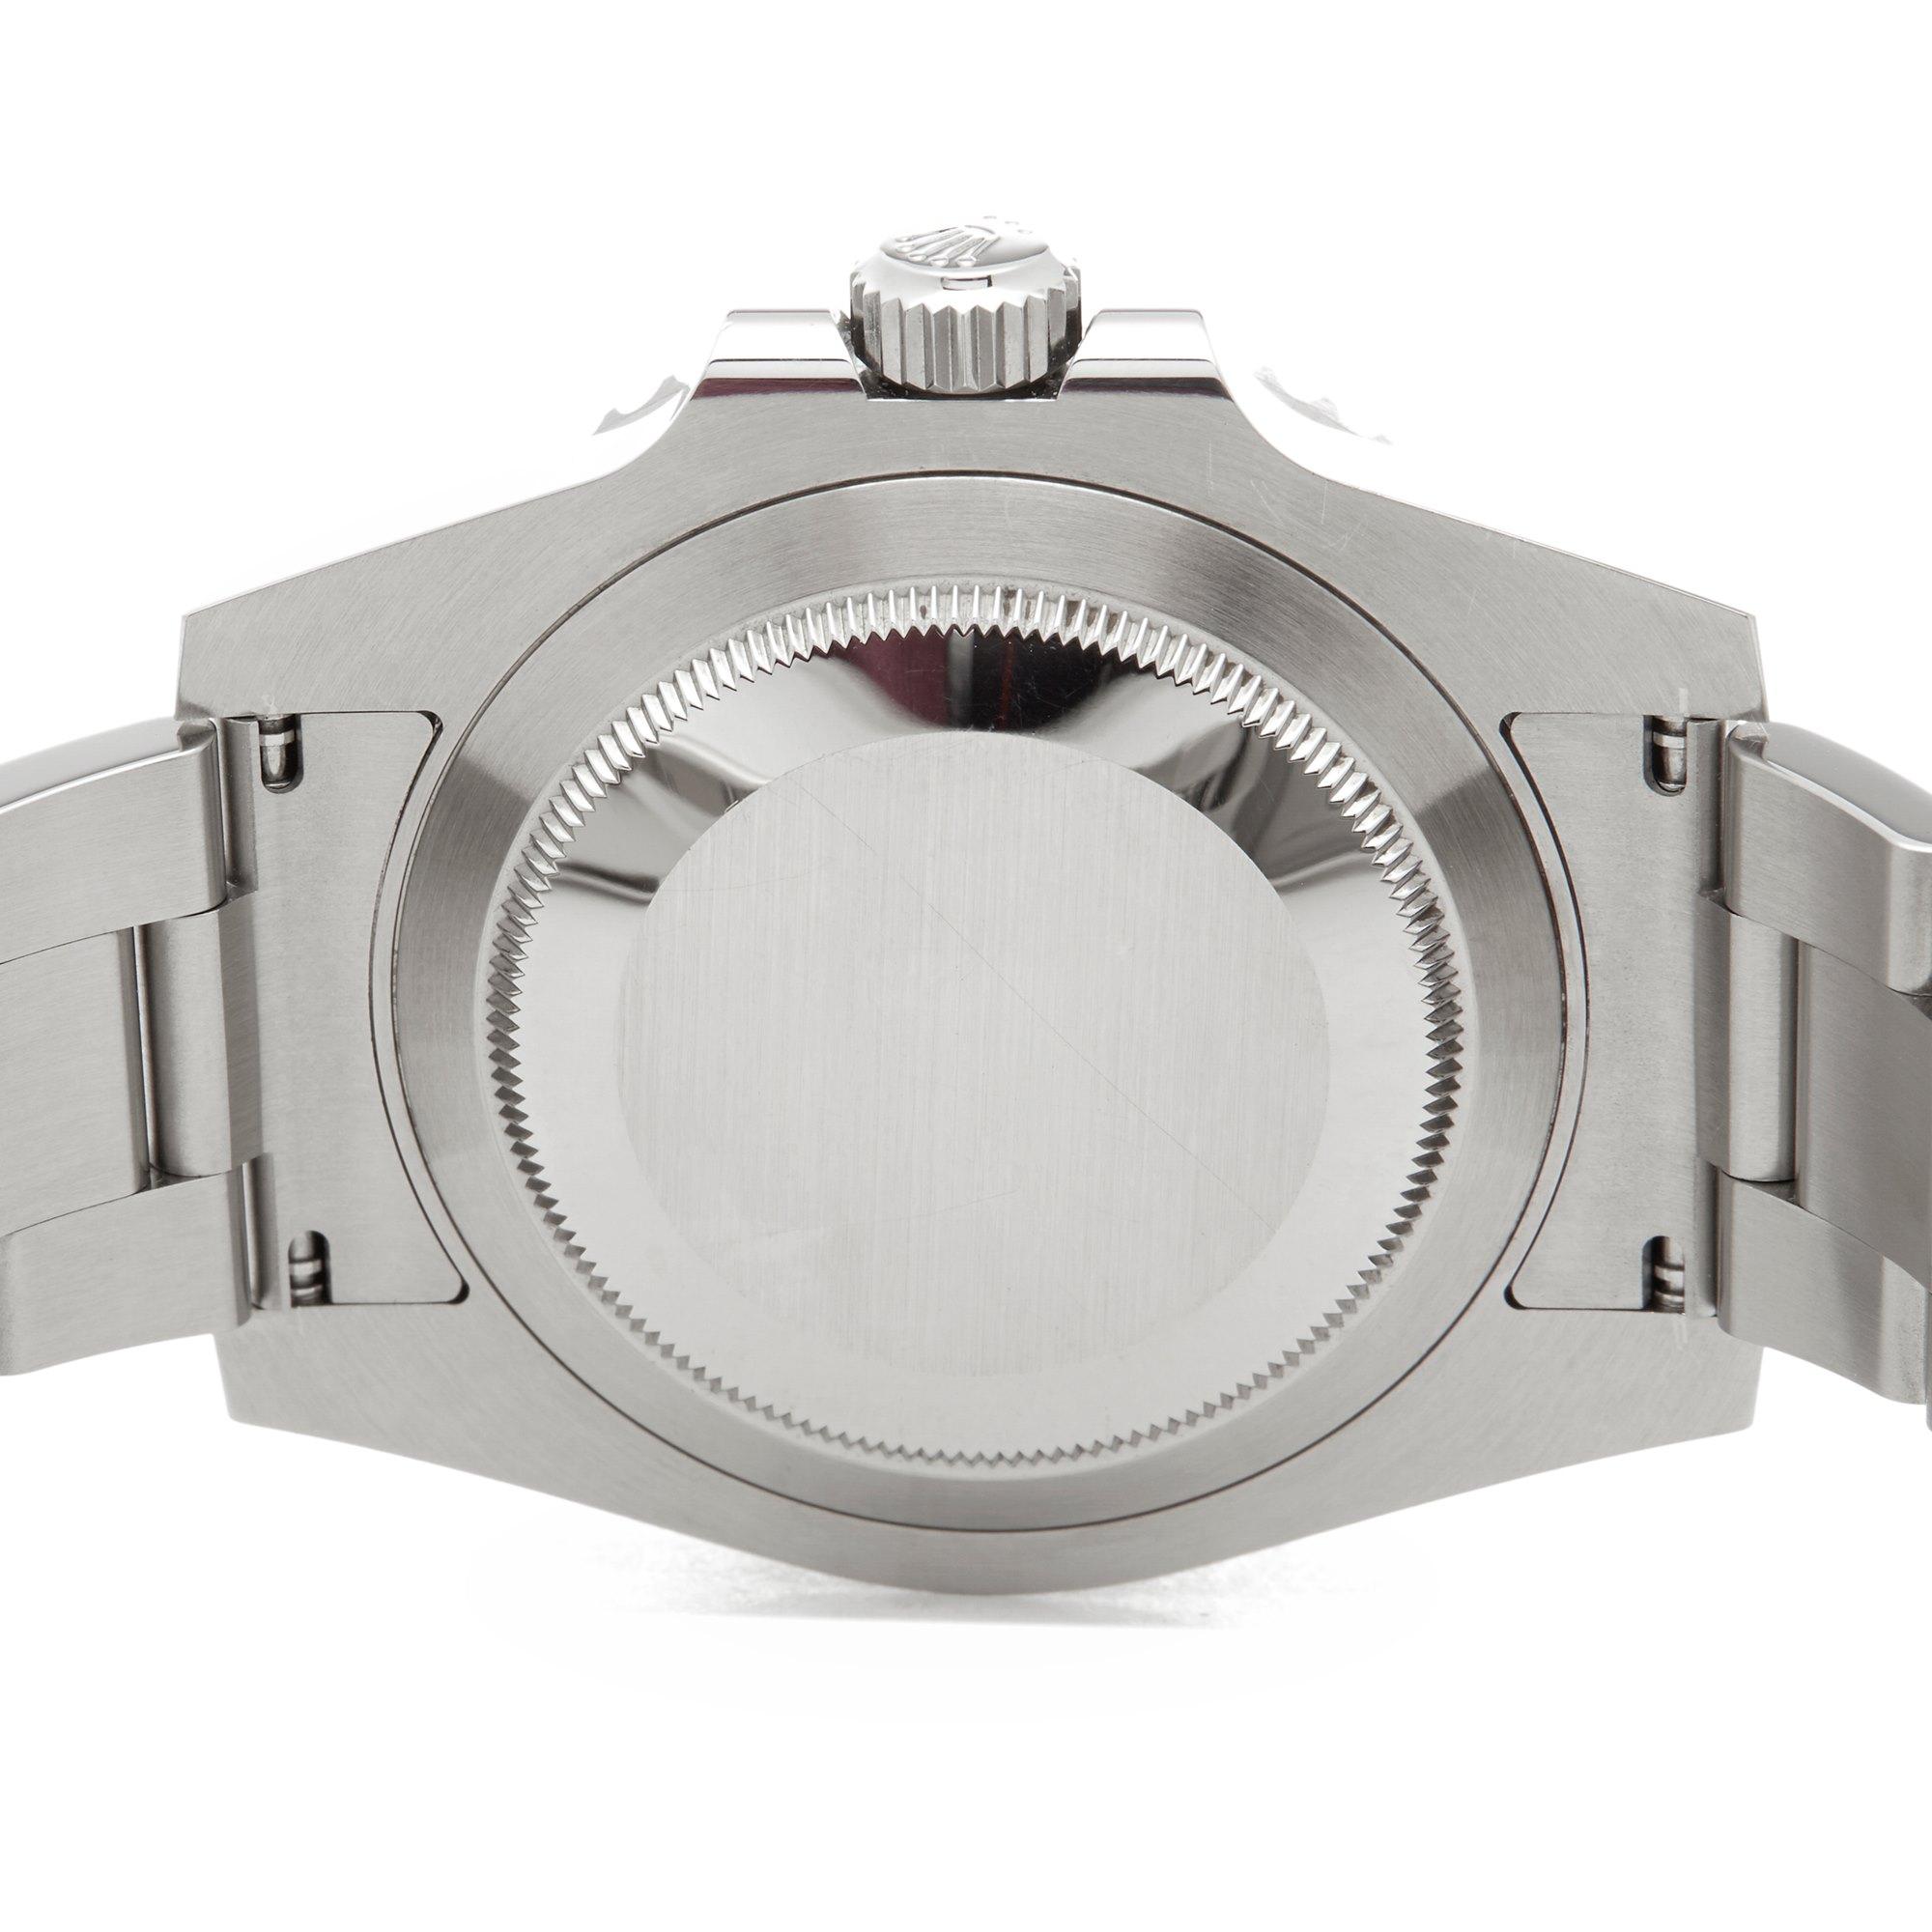 Rolex Submariner Non Date Roestvrij Staal 114060